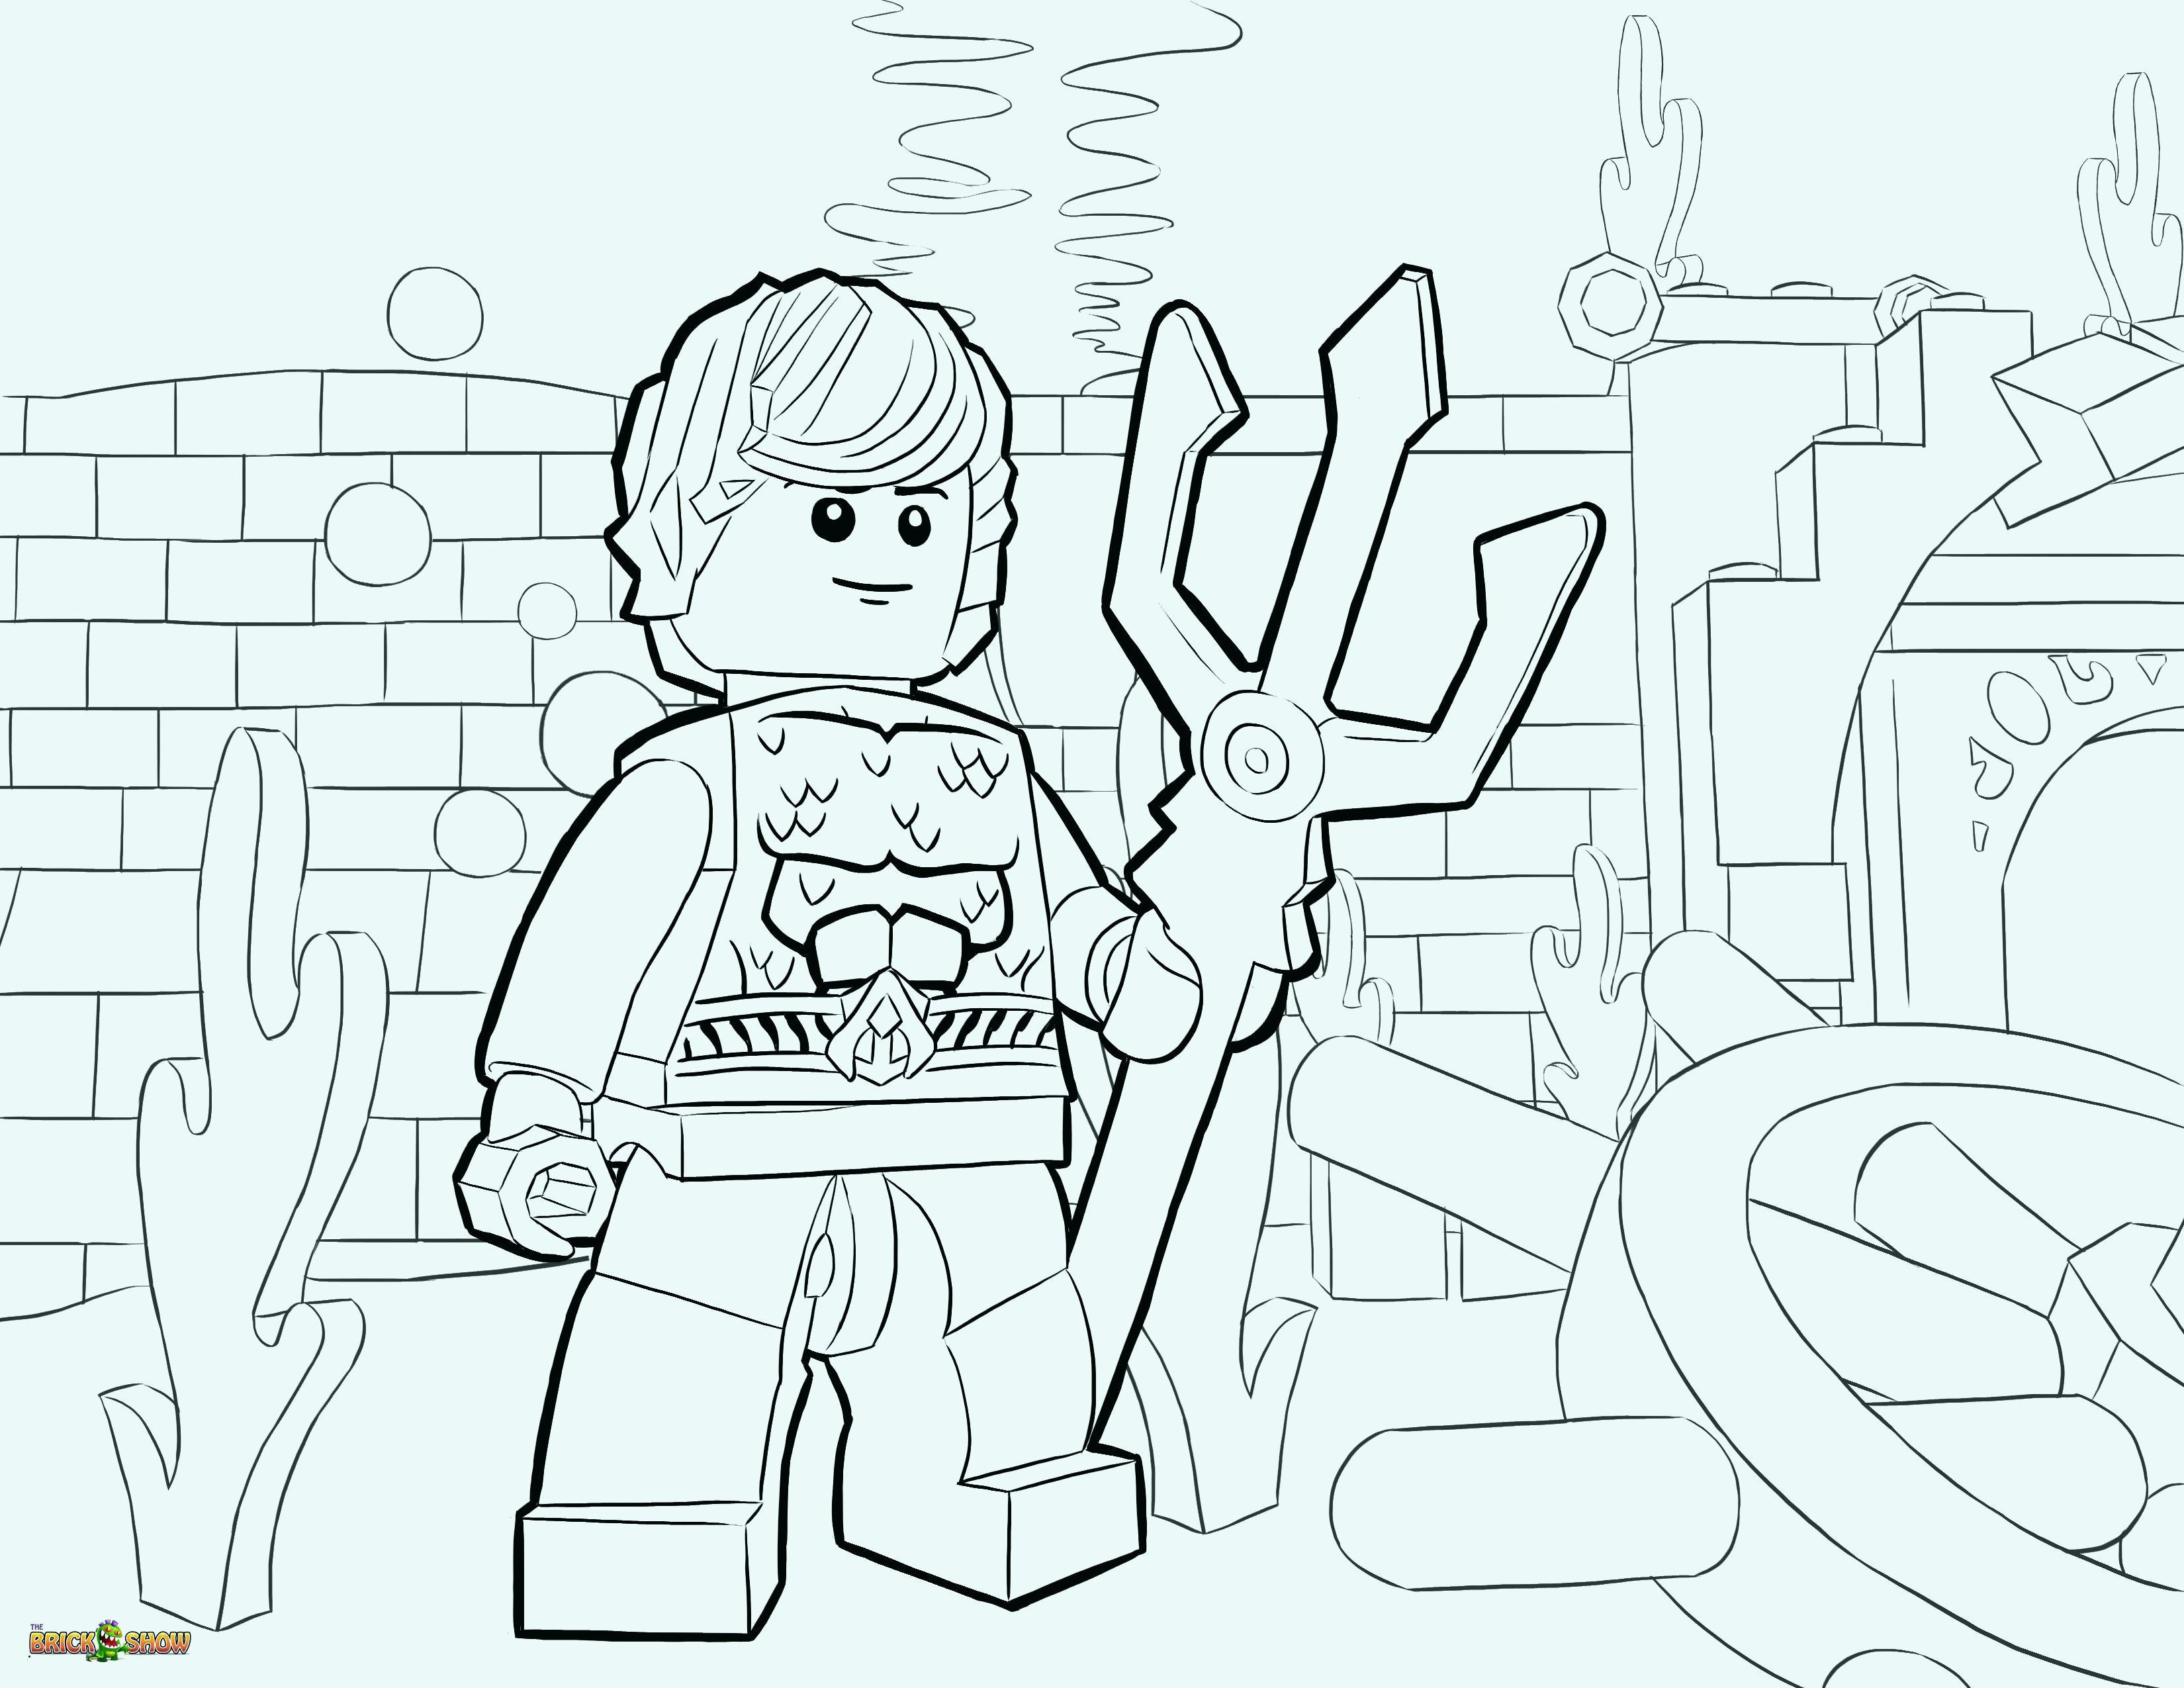 Ausmalbilder Lego Neu Lego Spiderman Ausmalbilder General Grievous Lego Coloring Stock